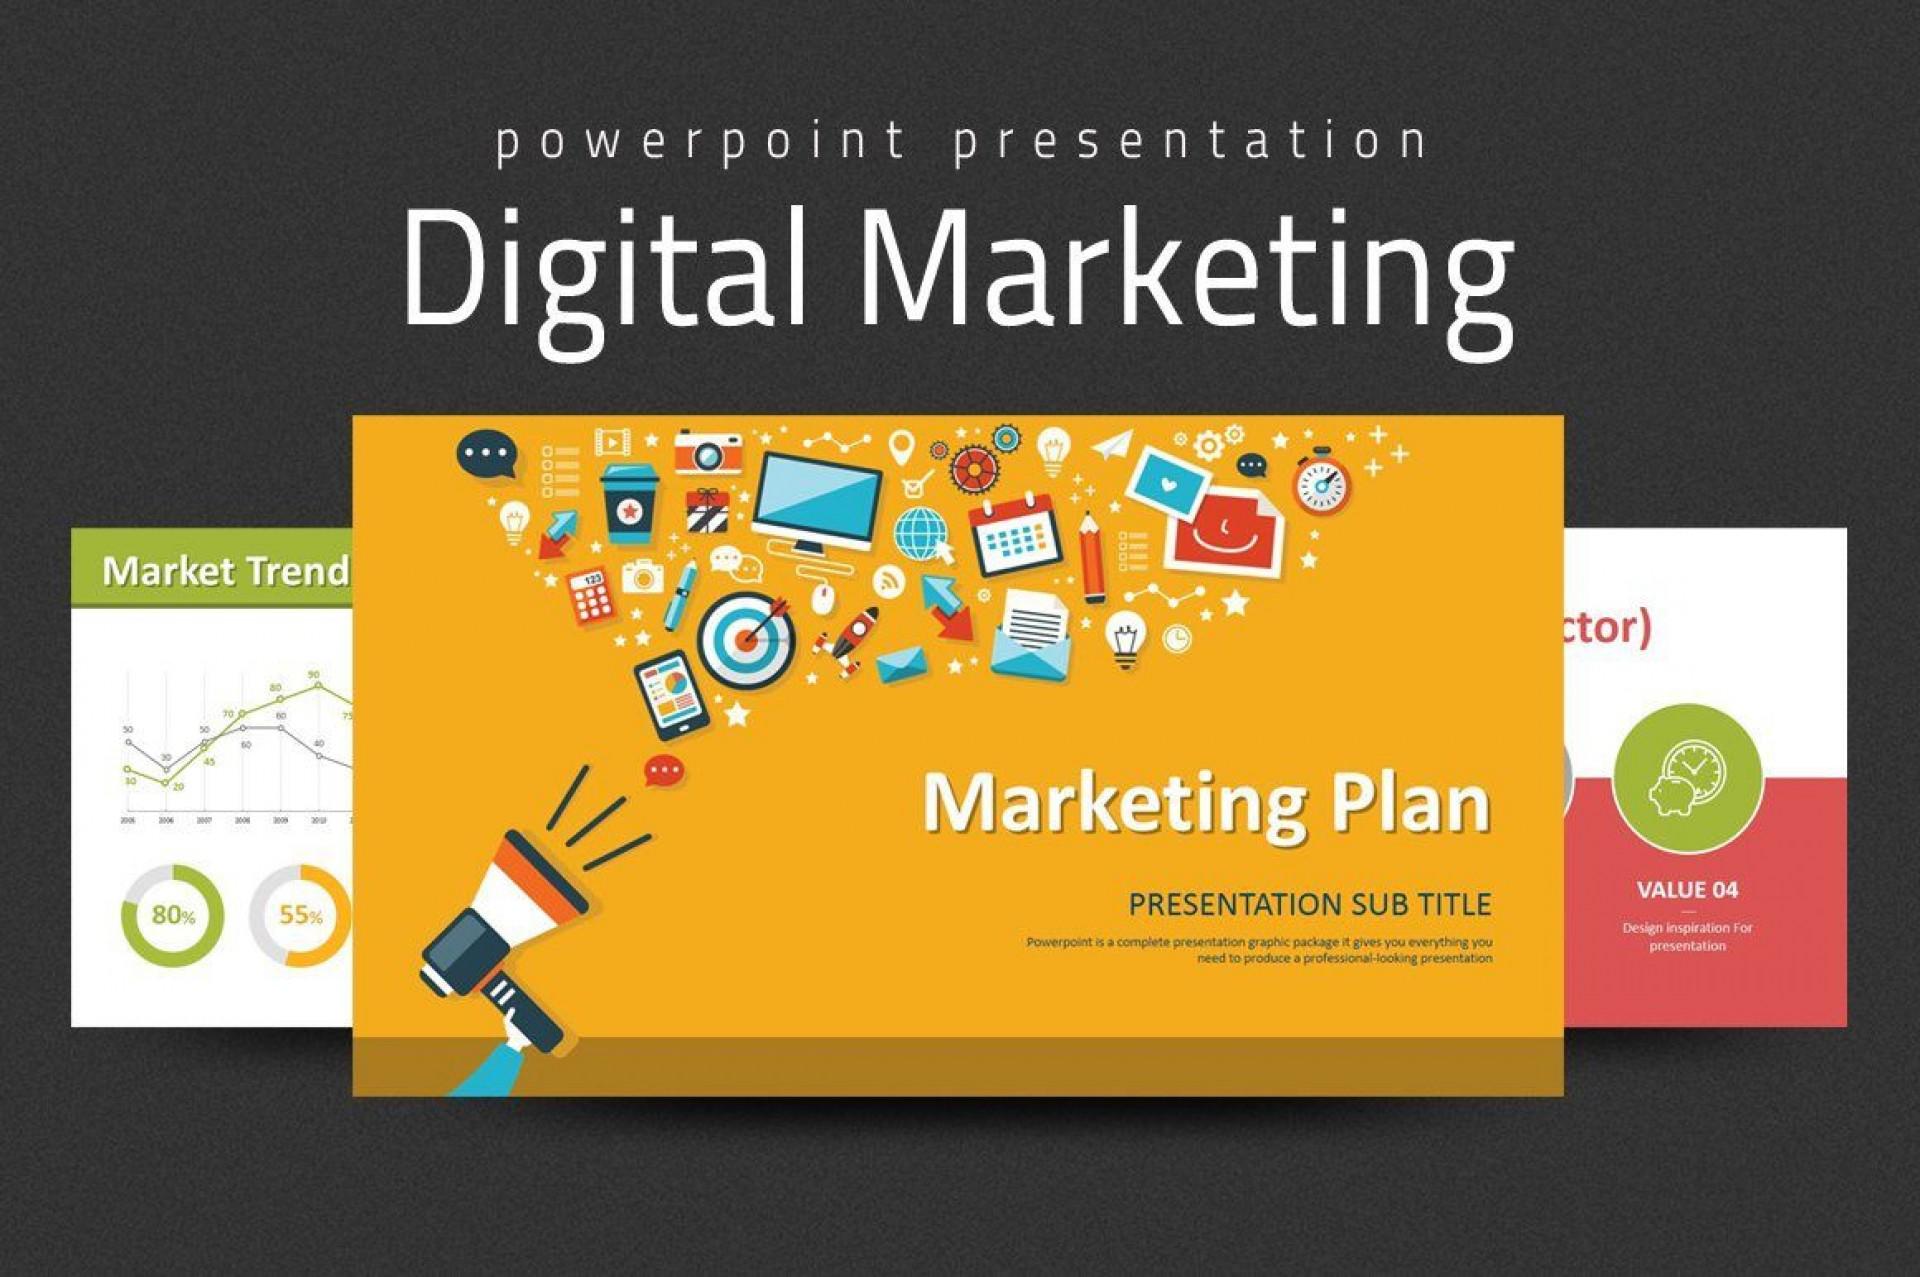 000 Unique Digital Marketing Plan Example Ppt Photo 1920